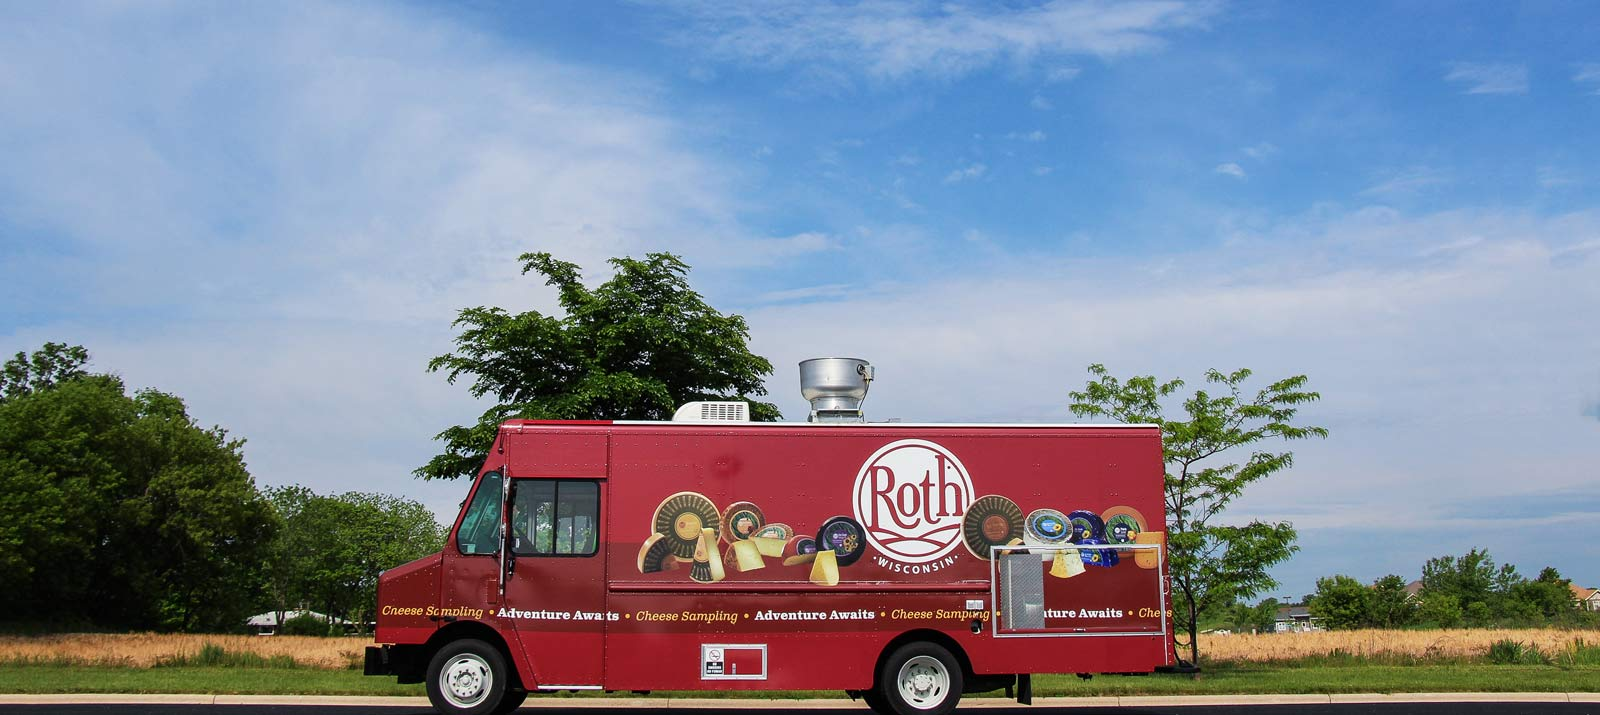 Follow the Roth Cheese taste trek.